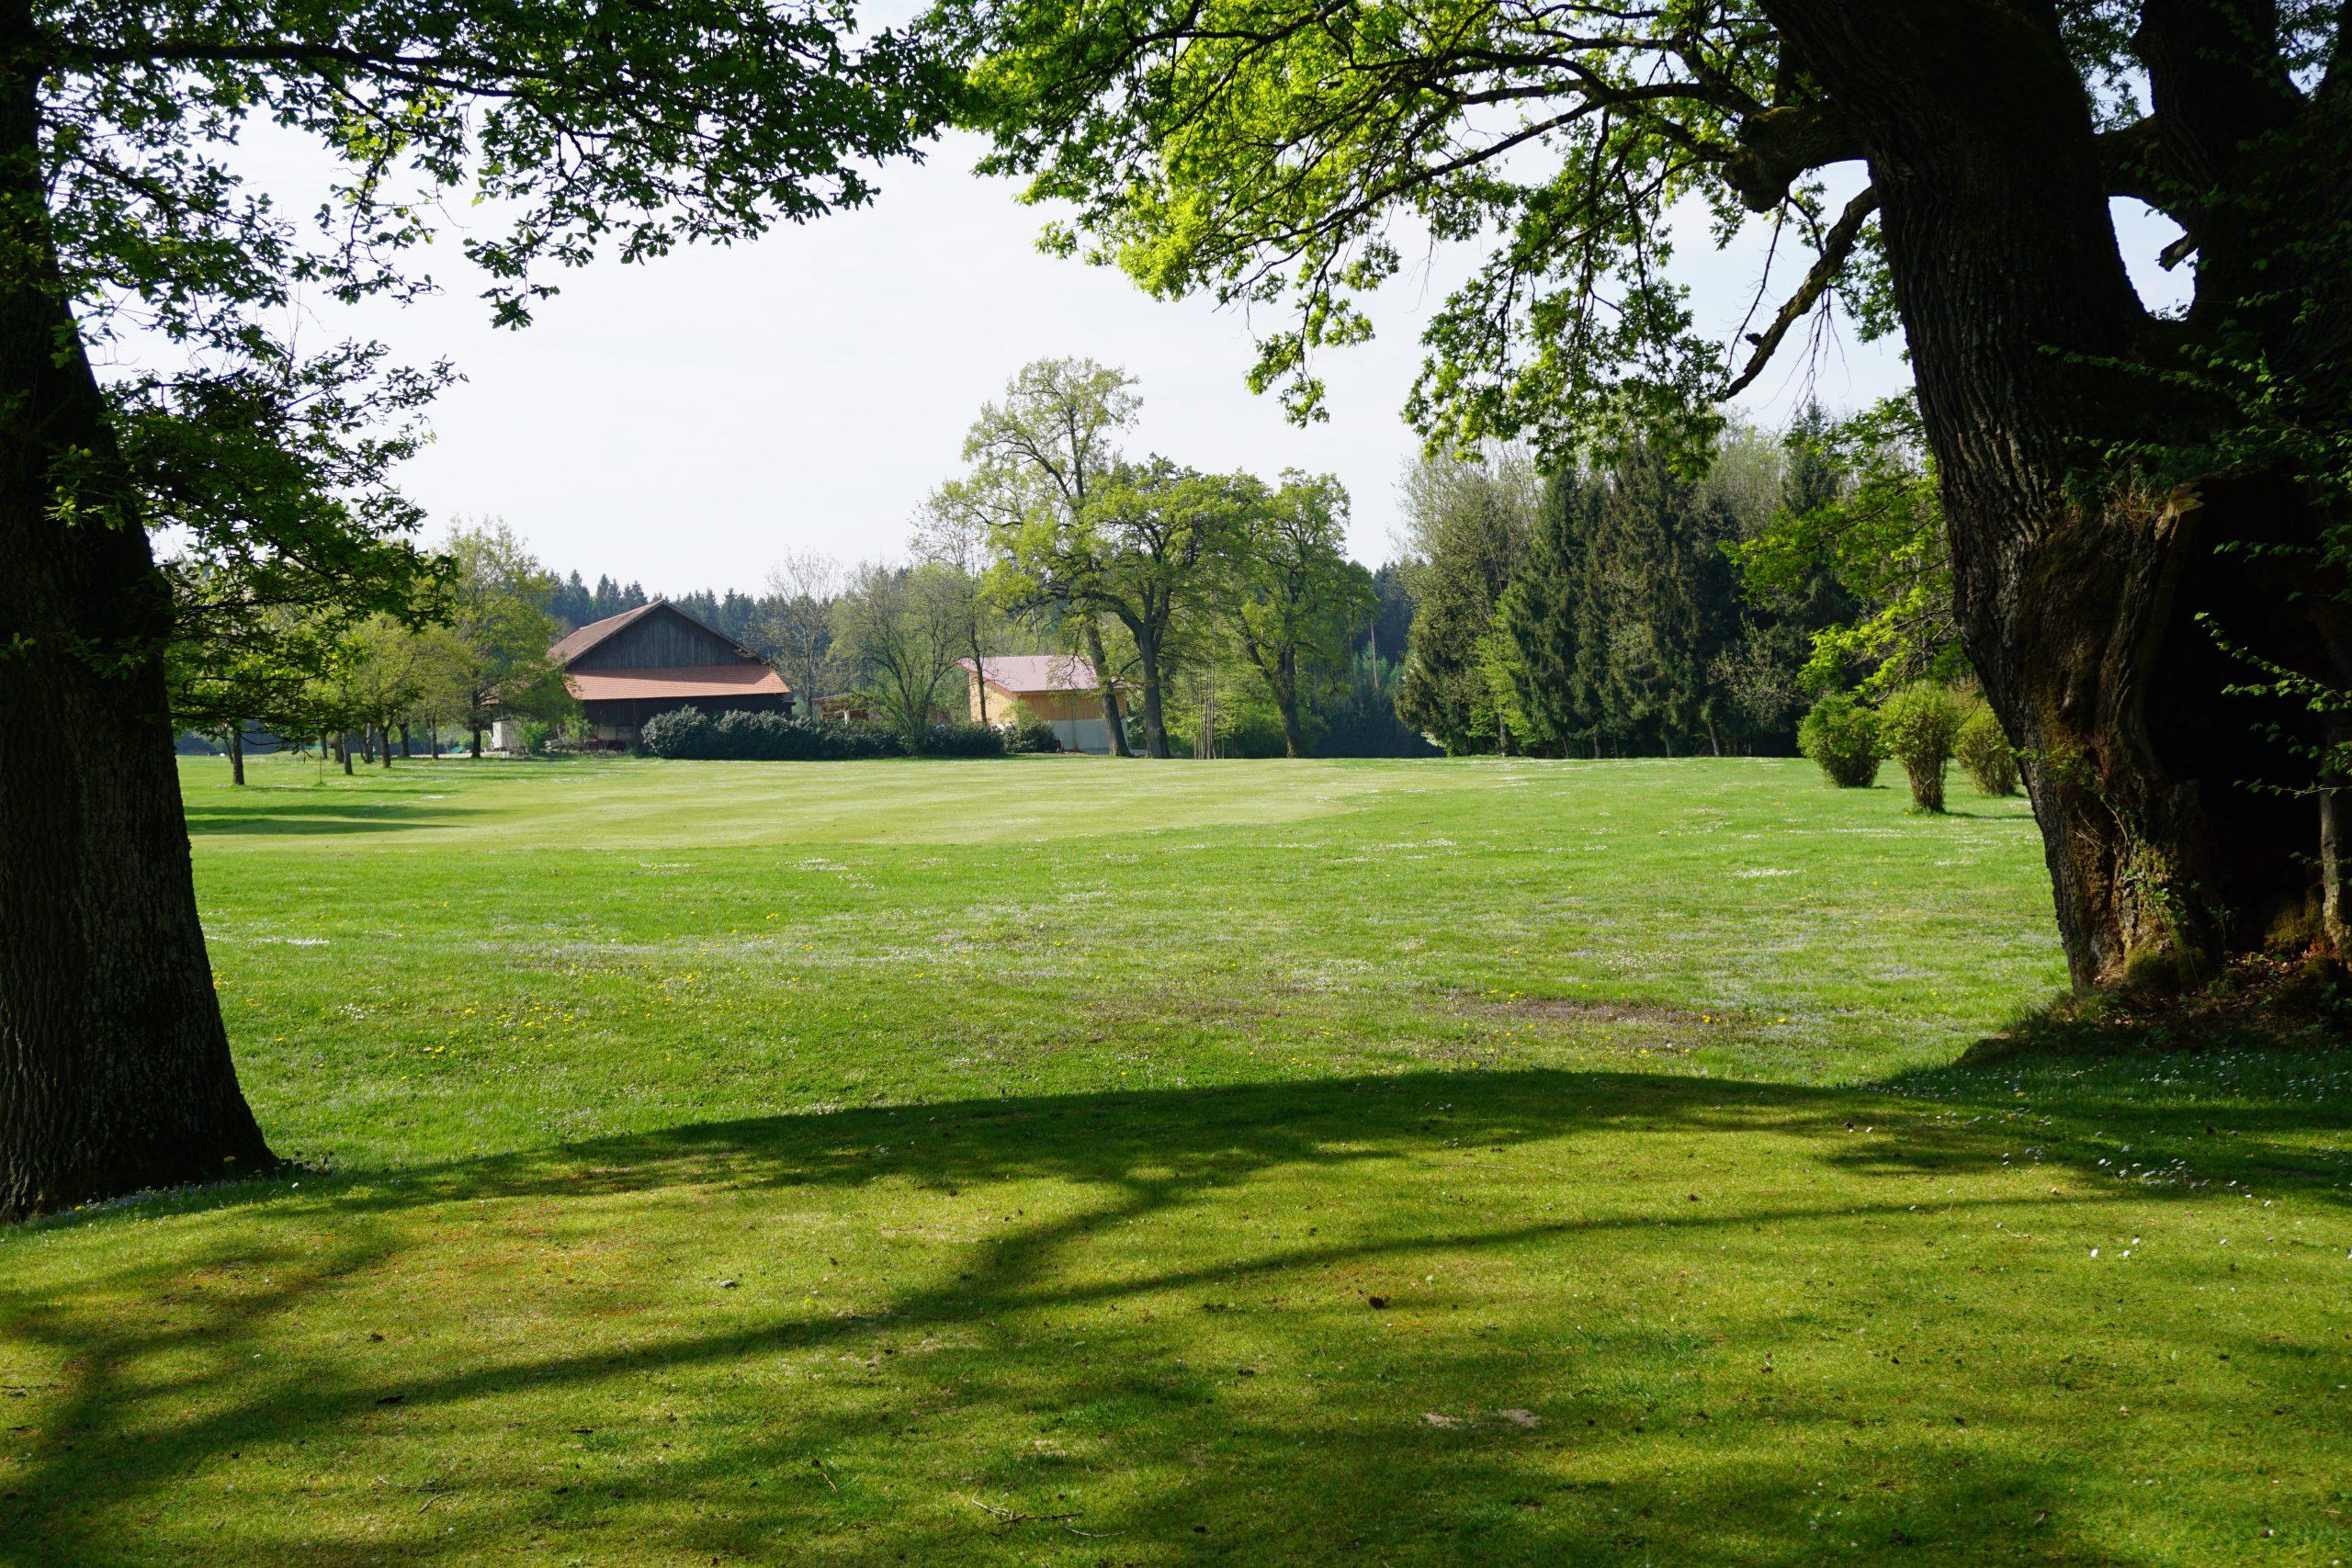 Golfclub Schloss Igling Bahn 2/11